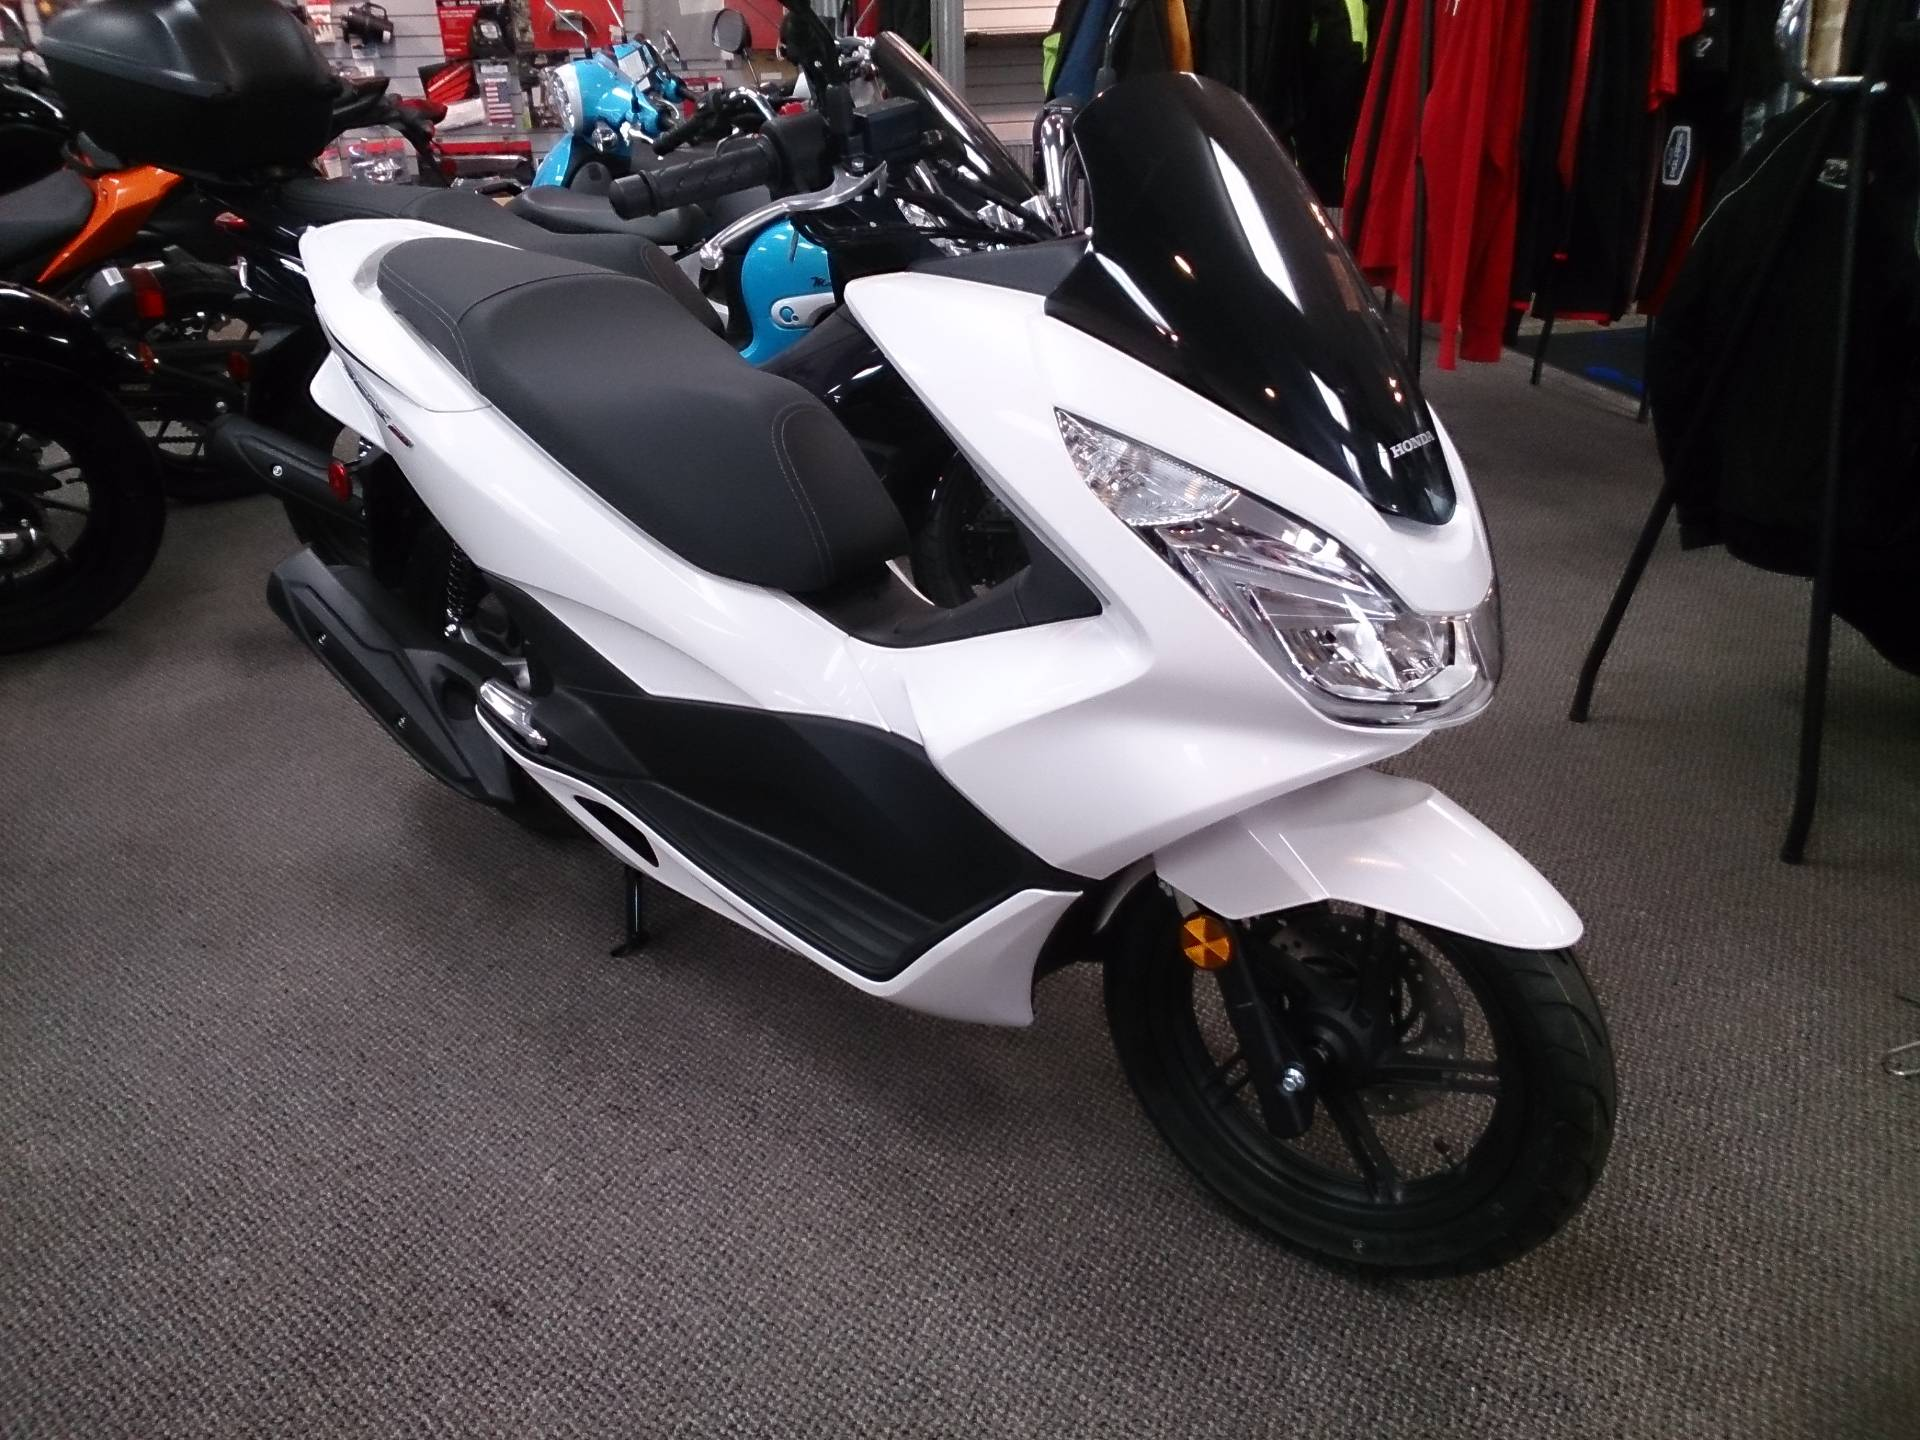 Honda Pcx 150 >> 2018 Honda Pcx150 Scooters Sterling Illinois N A